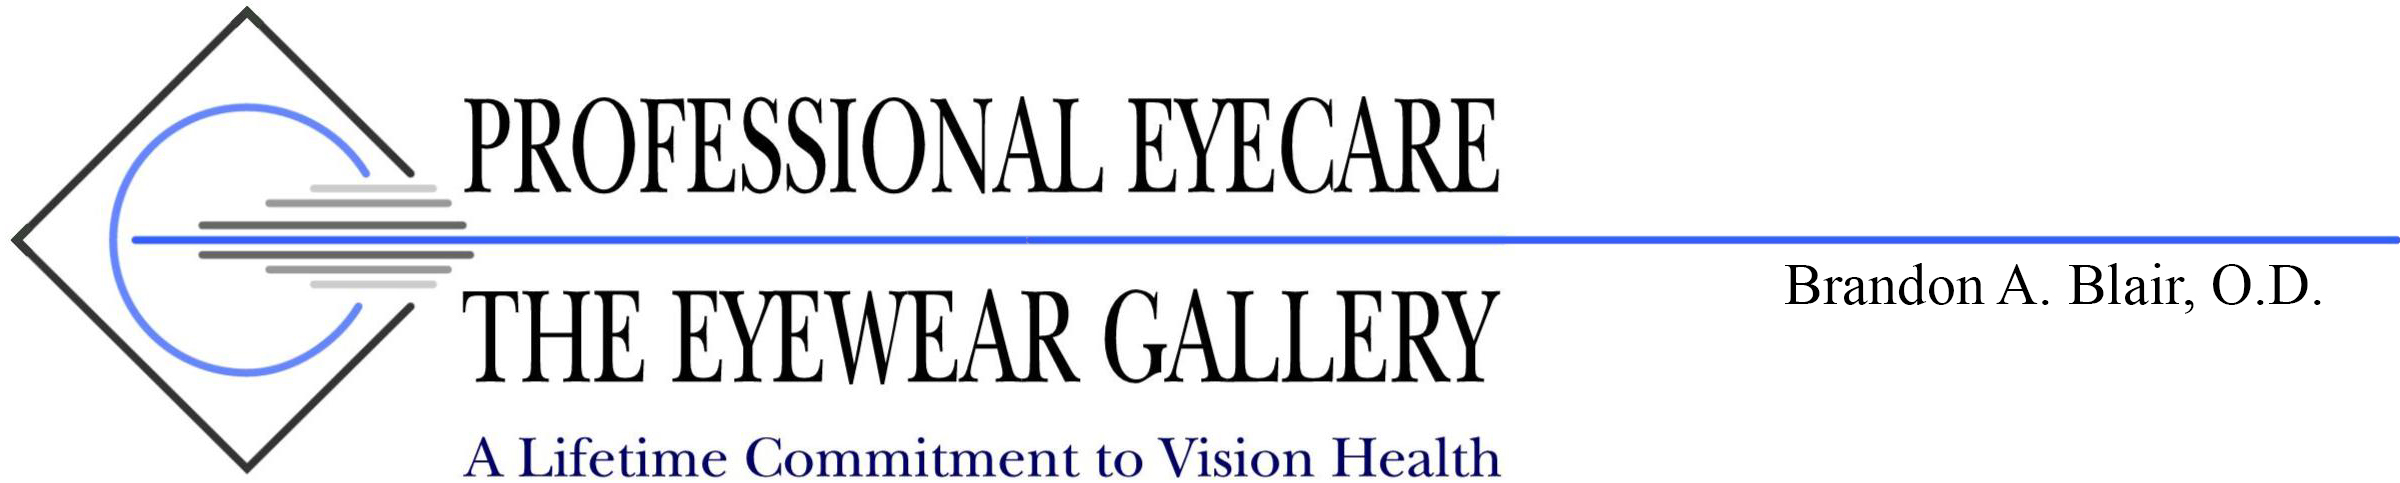 Professional Eyecare Logo